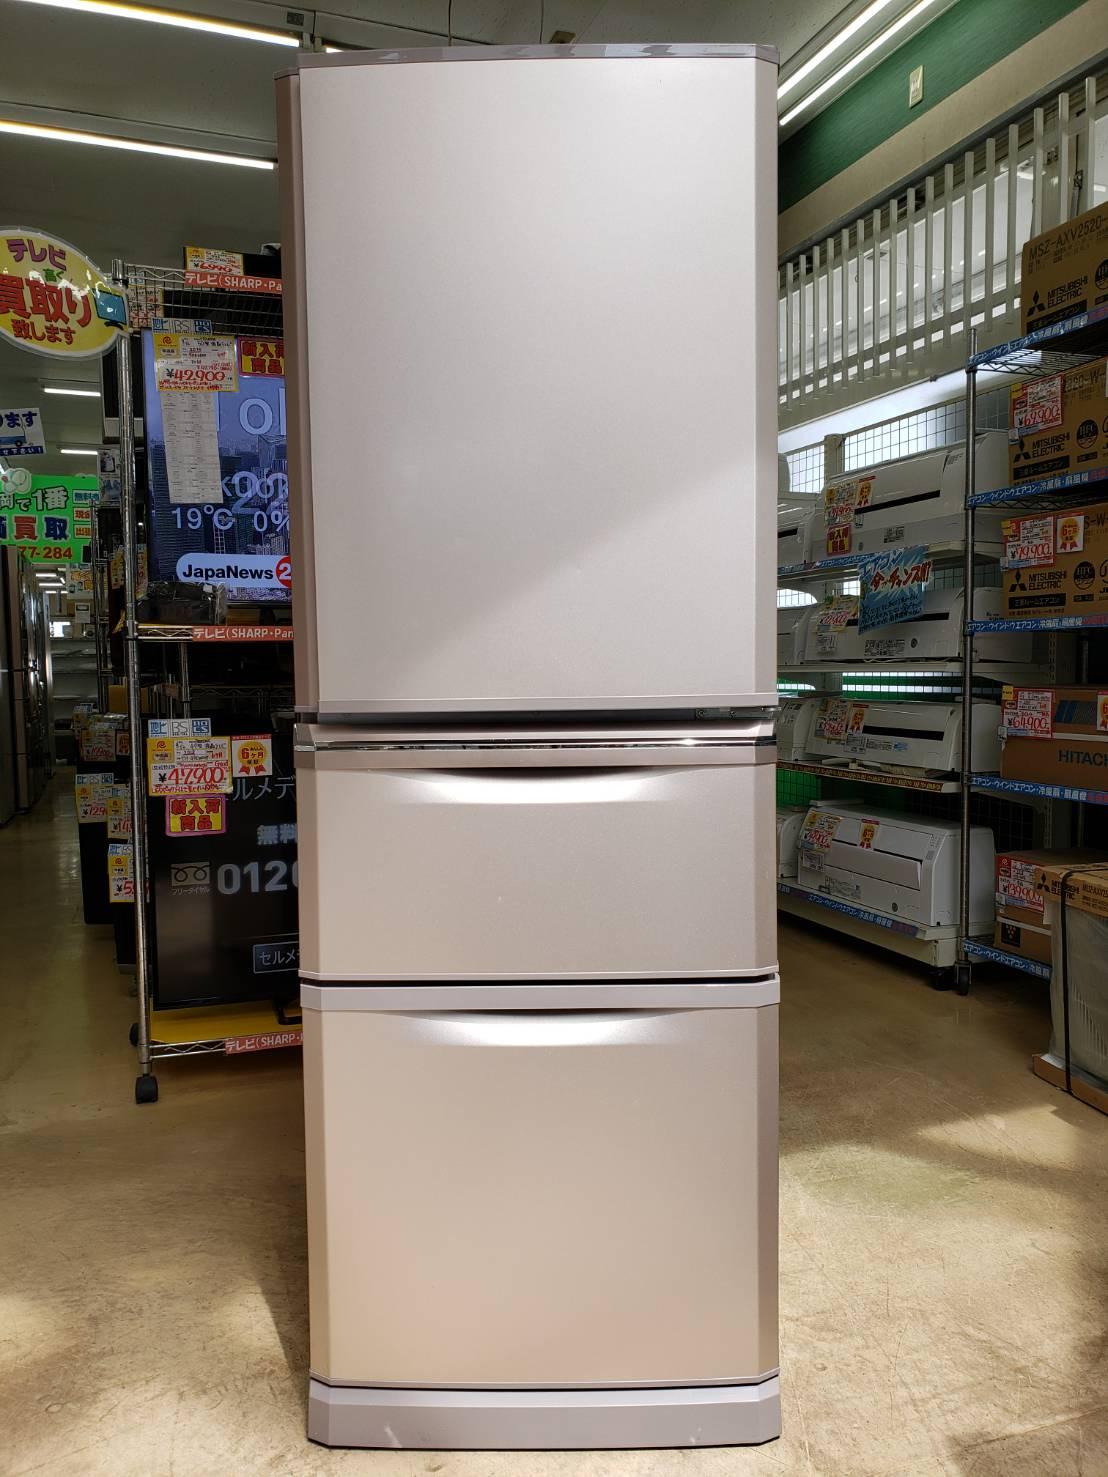 MITSUBISHI / 三菱 335L冷蔵庫 MR-C34X 買取致しました。状態が良ければ古くても買取可能!の買取-